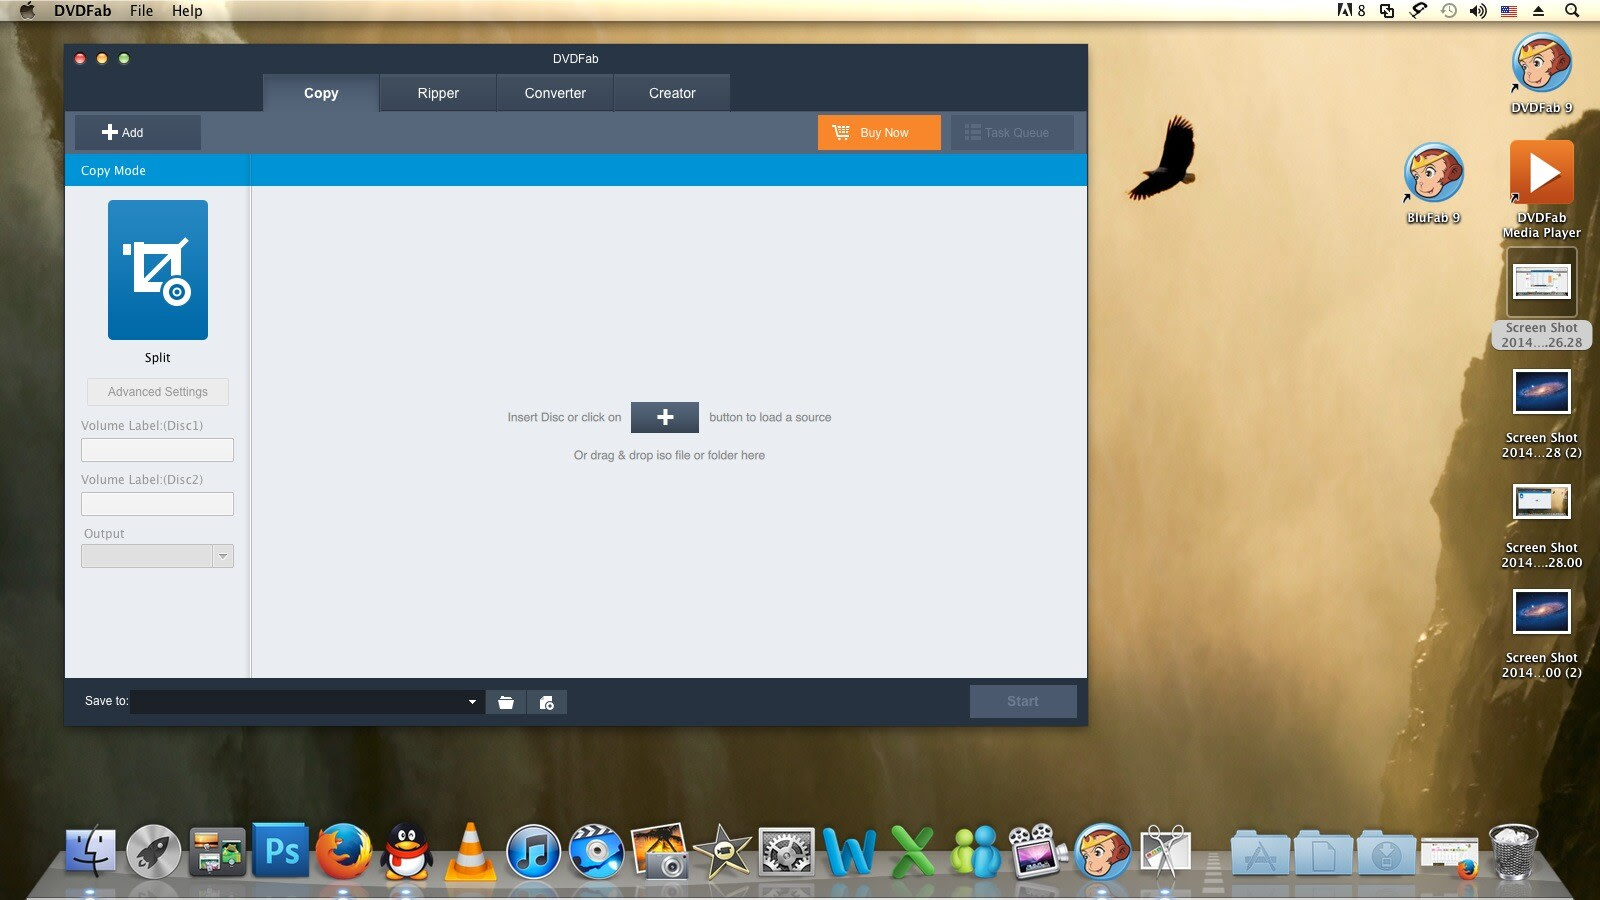 DVDFab para Mac